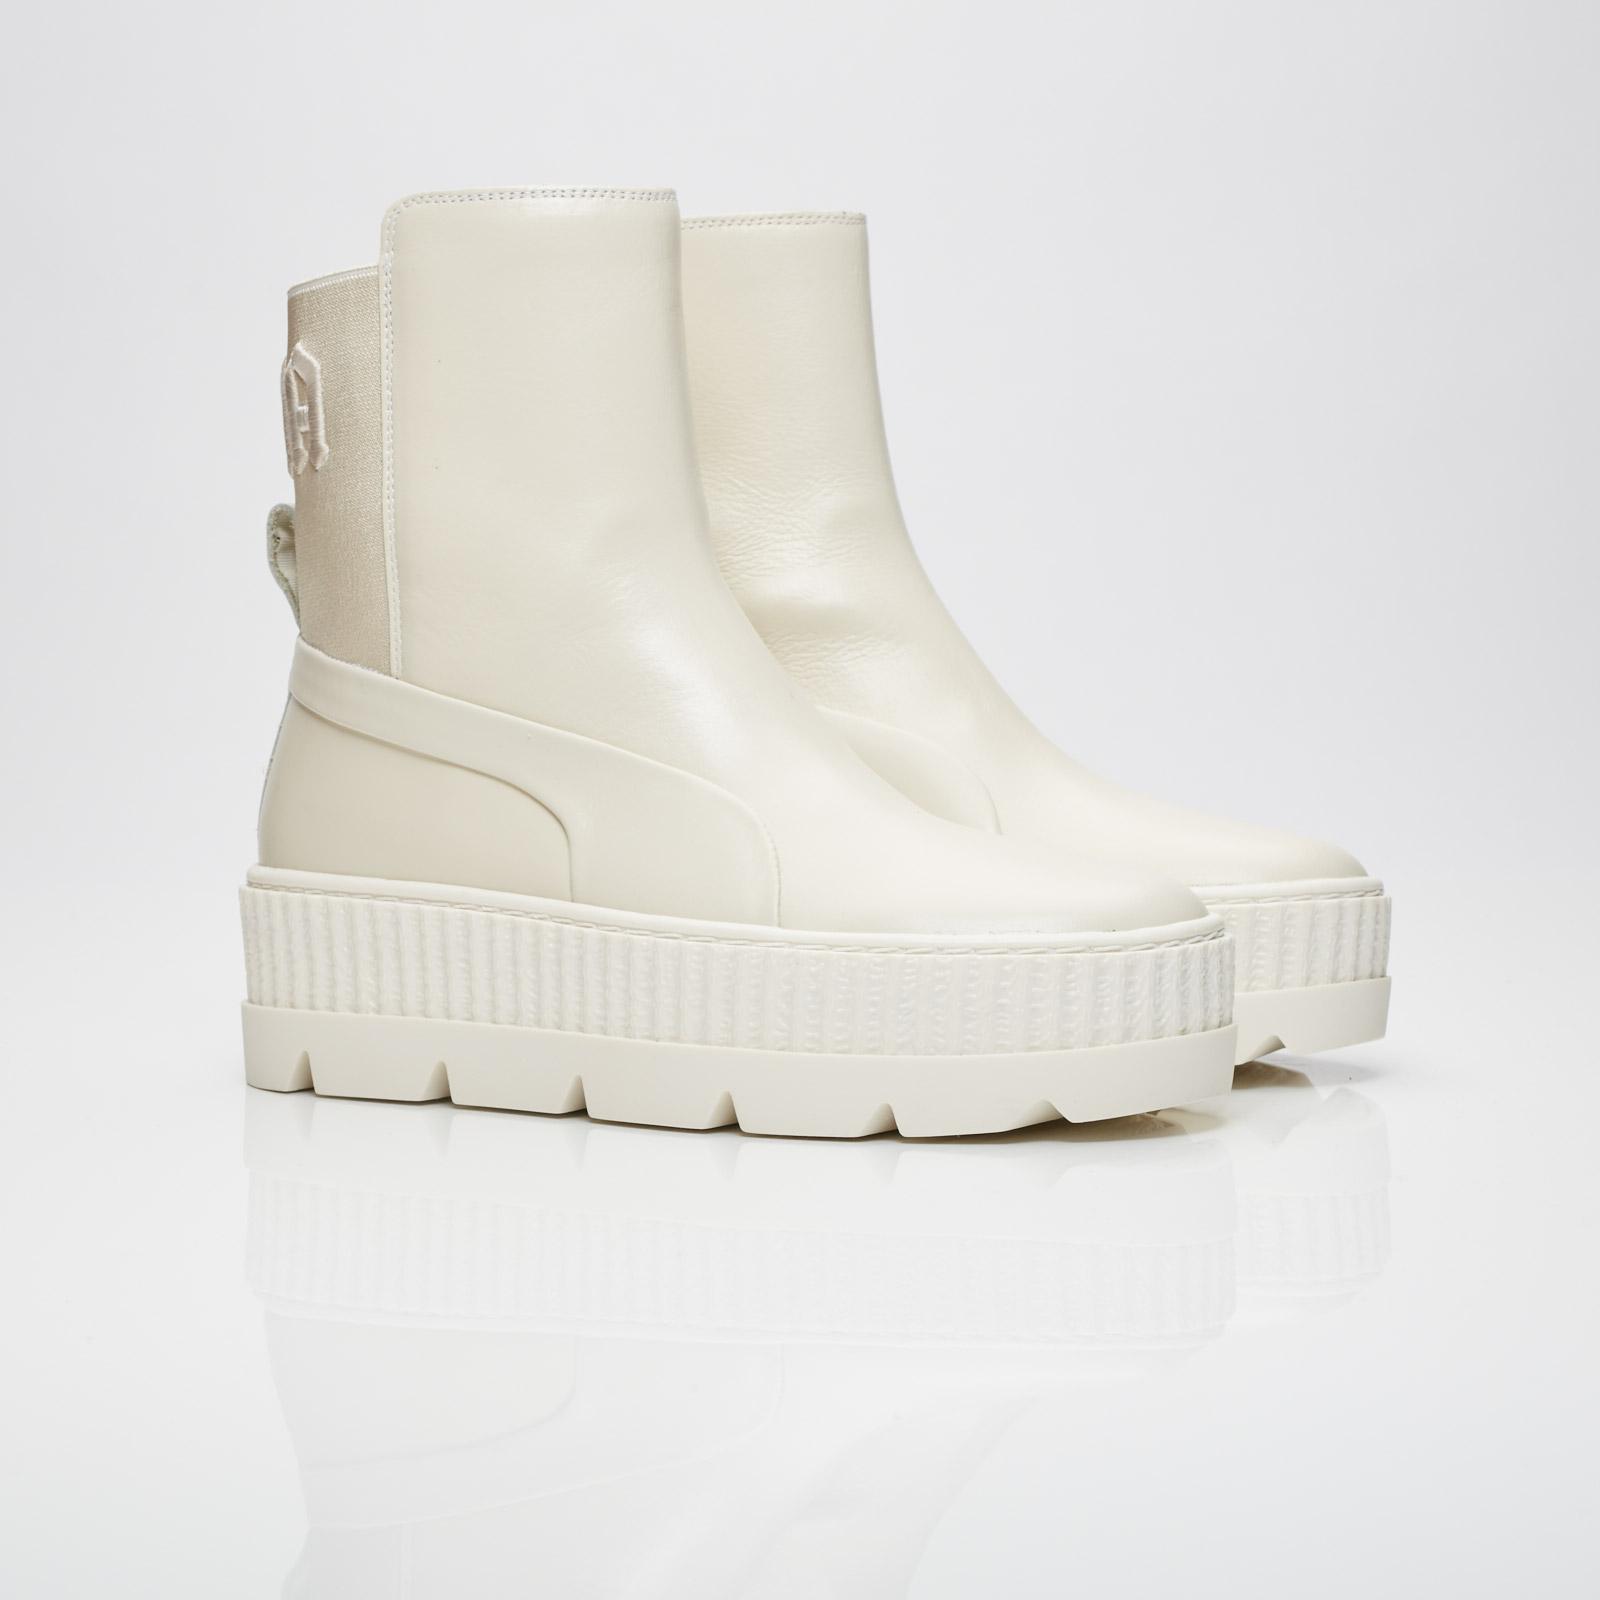 6058a7594a06 Puma Chelsea Sneaker Boot Wns - 366266-02 - Sneakersnstuff ...